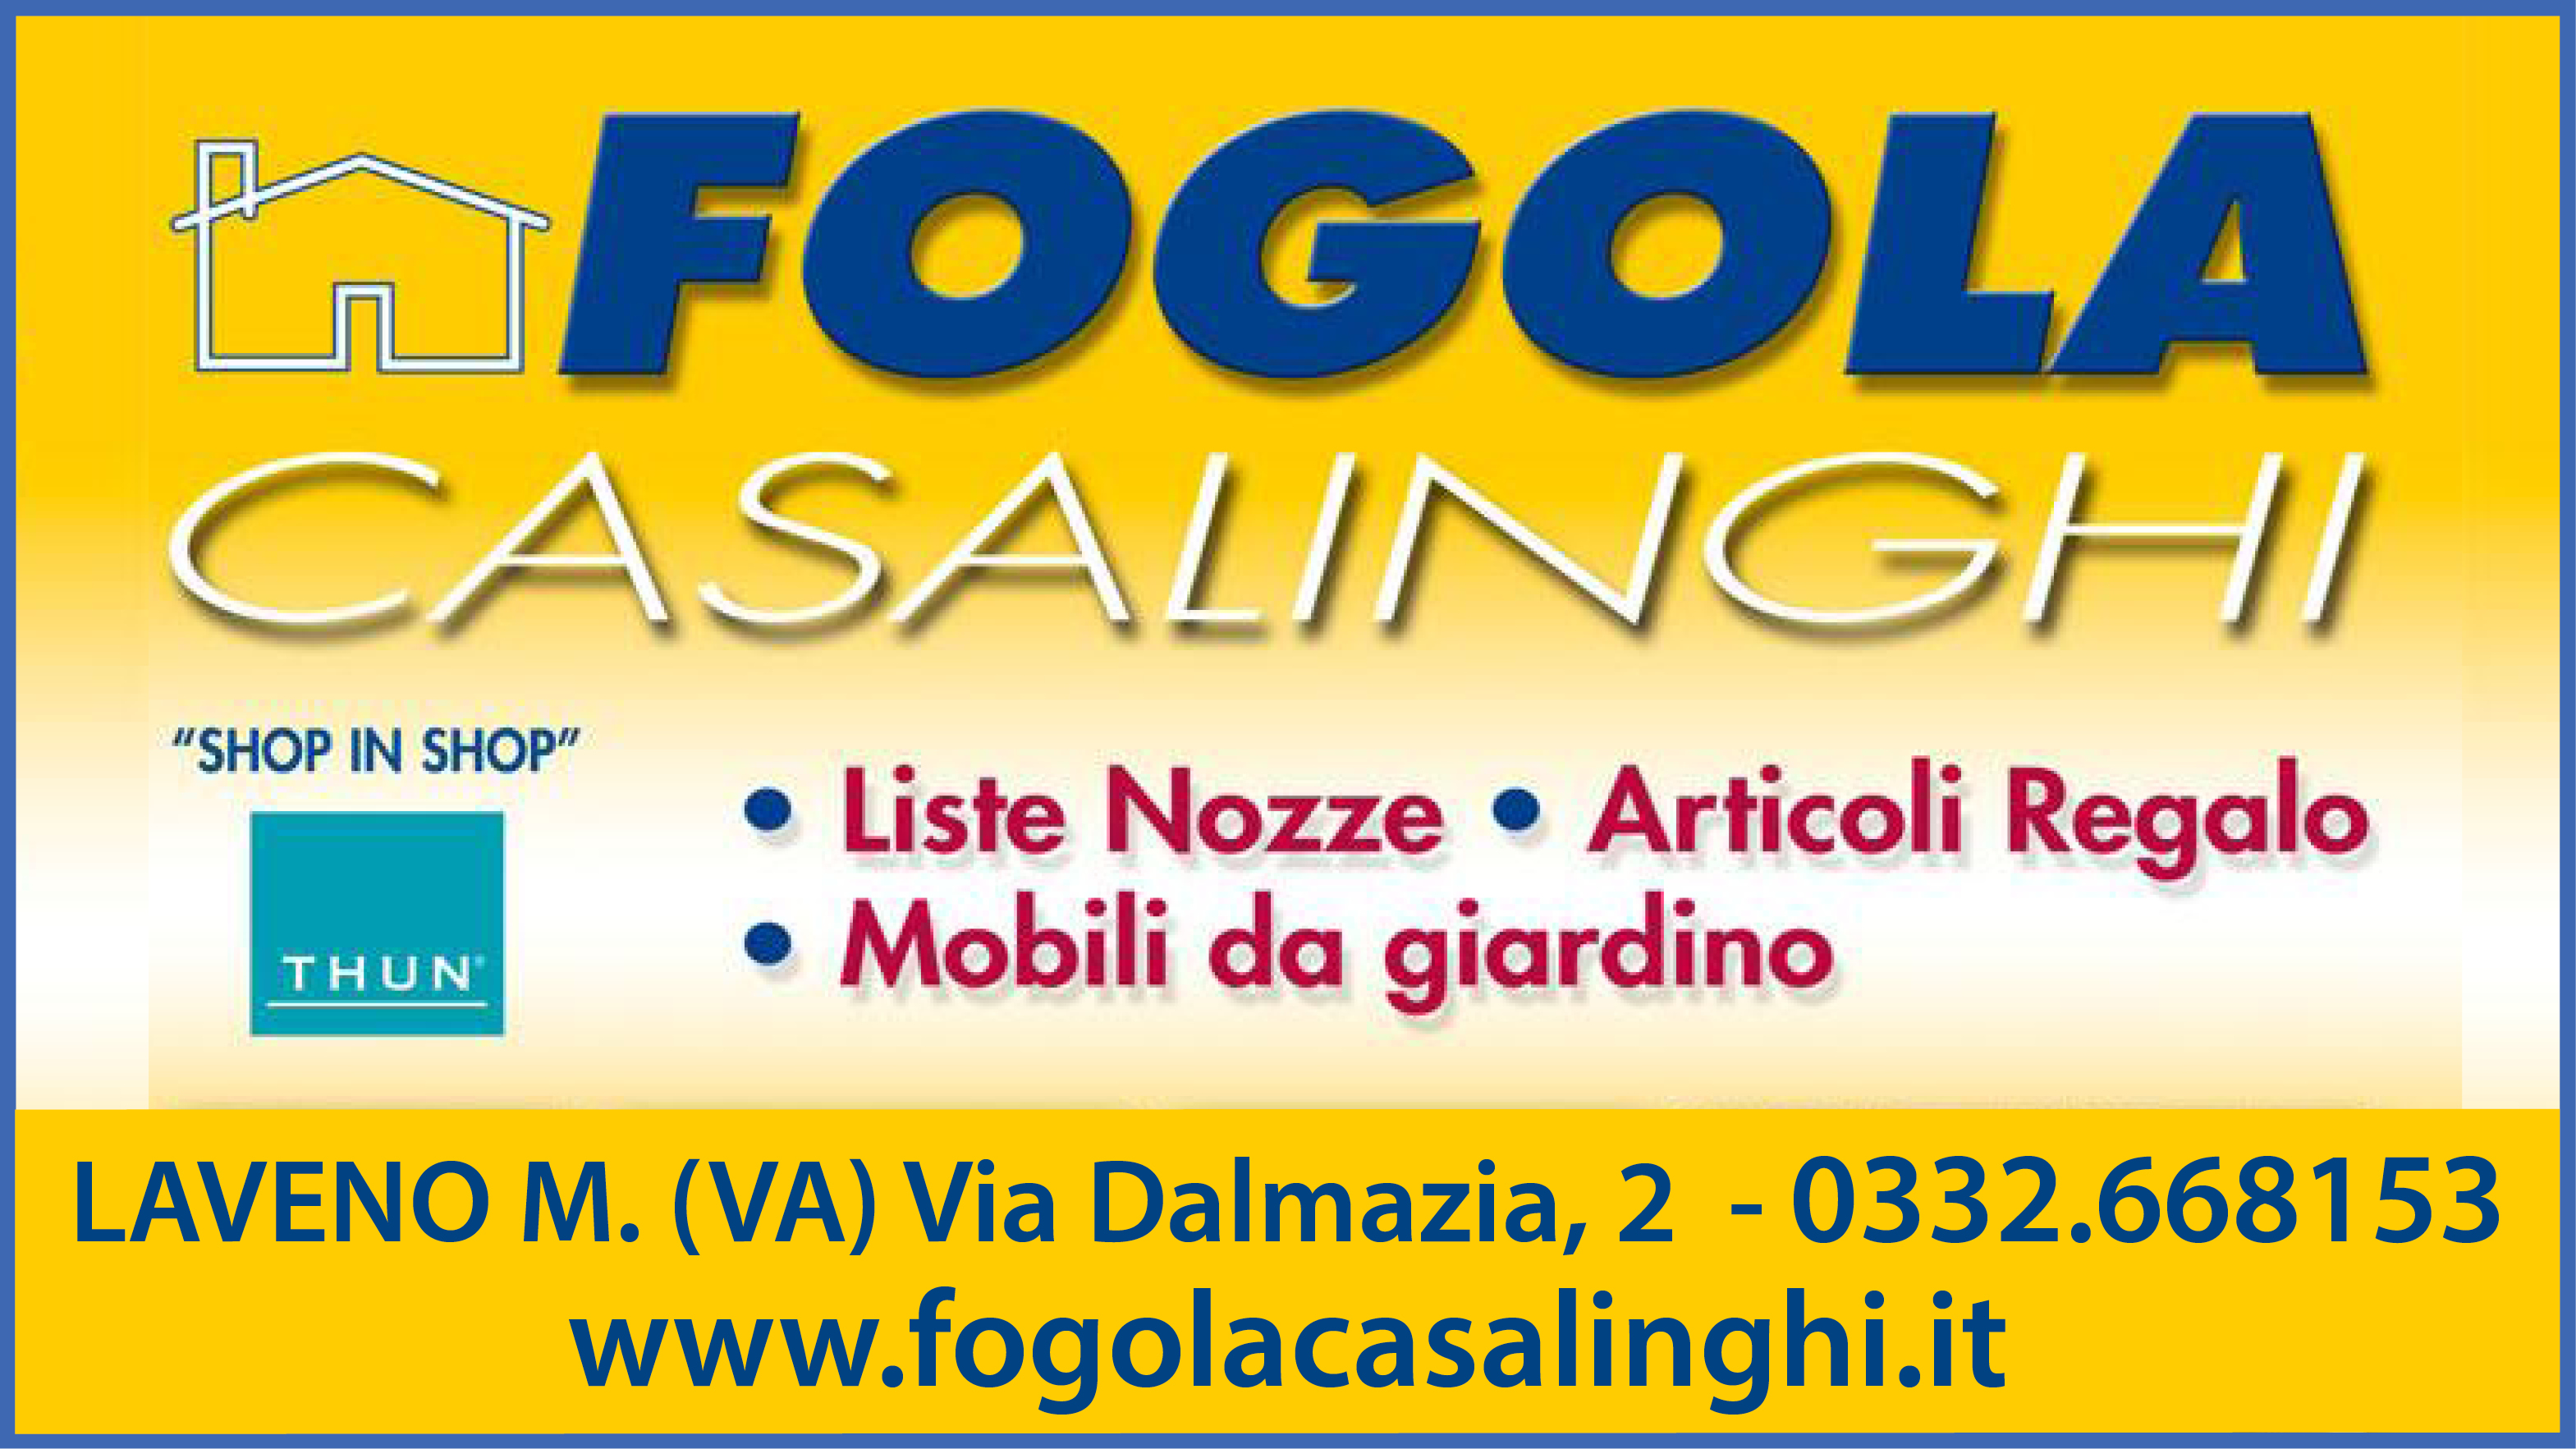 Fogola Casalinghi